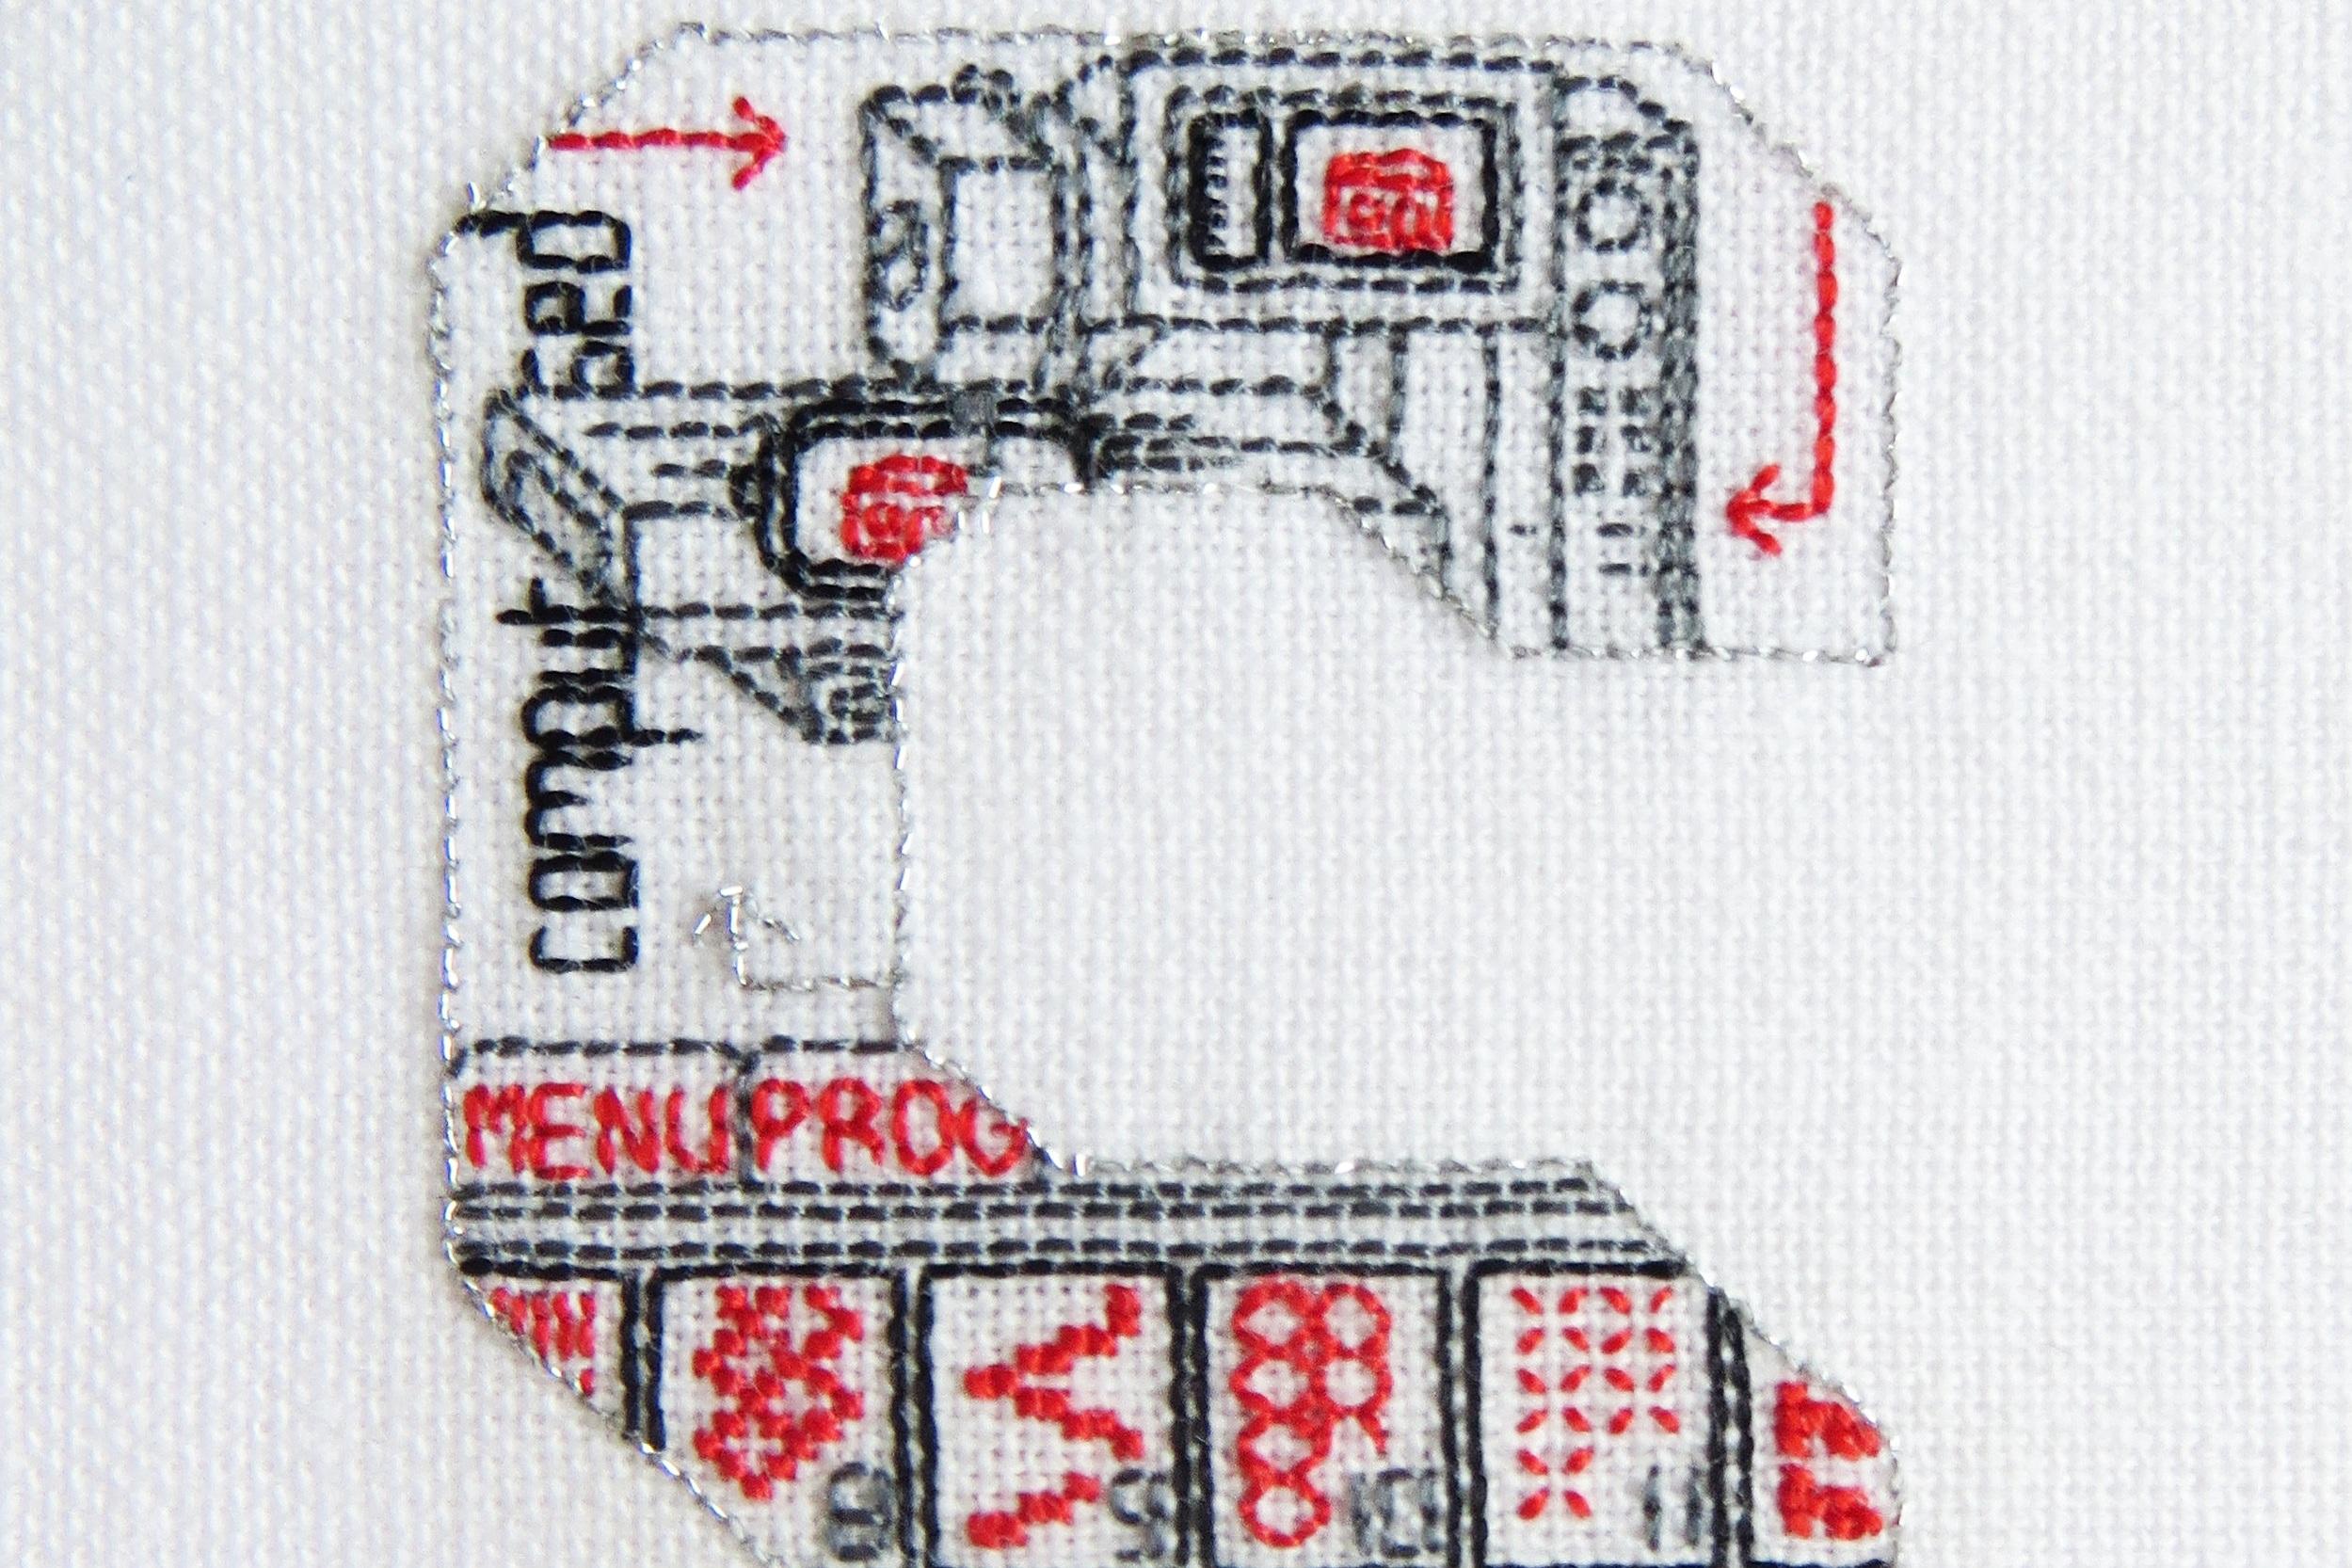 Stitches, 2013 - Commission